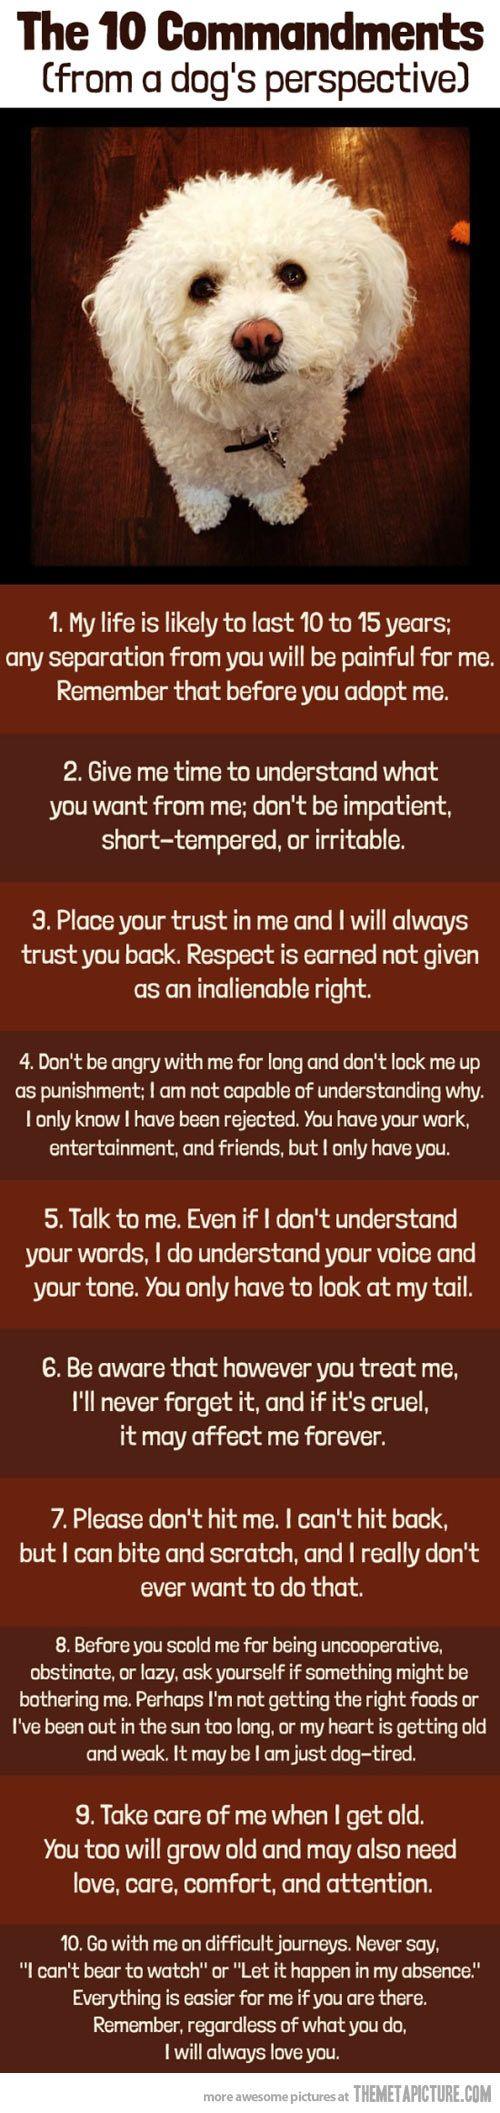 cool-commandments-dog-perspective-rules